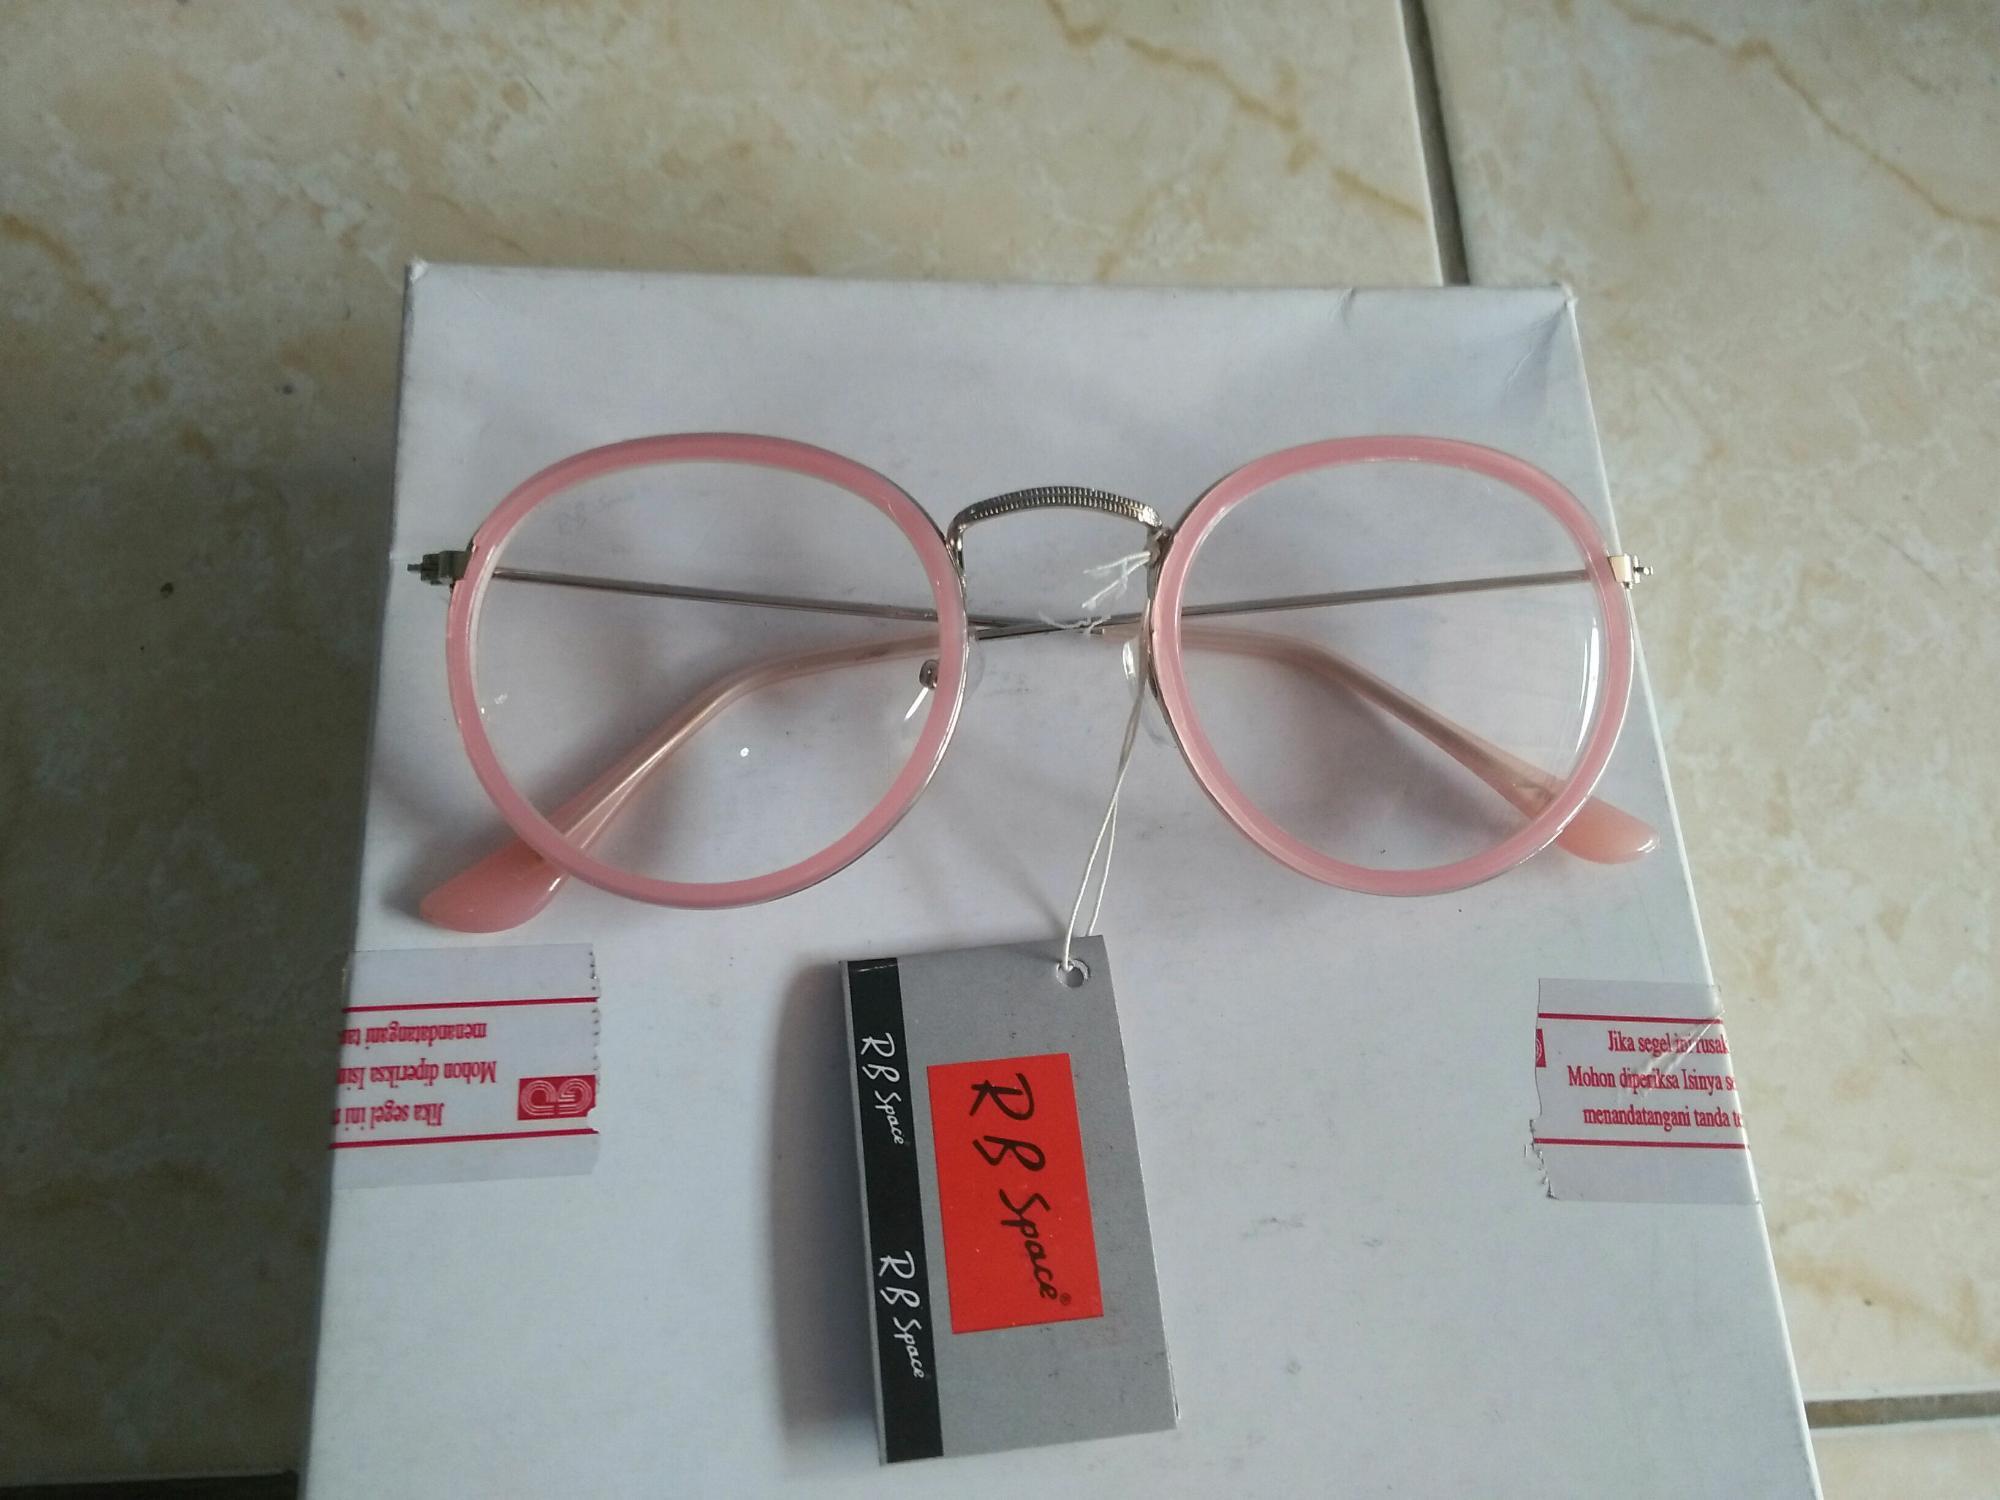 Promo Kacamata Minus 200 Kacamata Murah Trendy Bulat Fashion Korea ... b21c8130f5